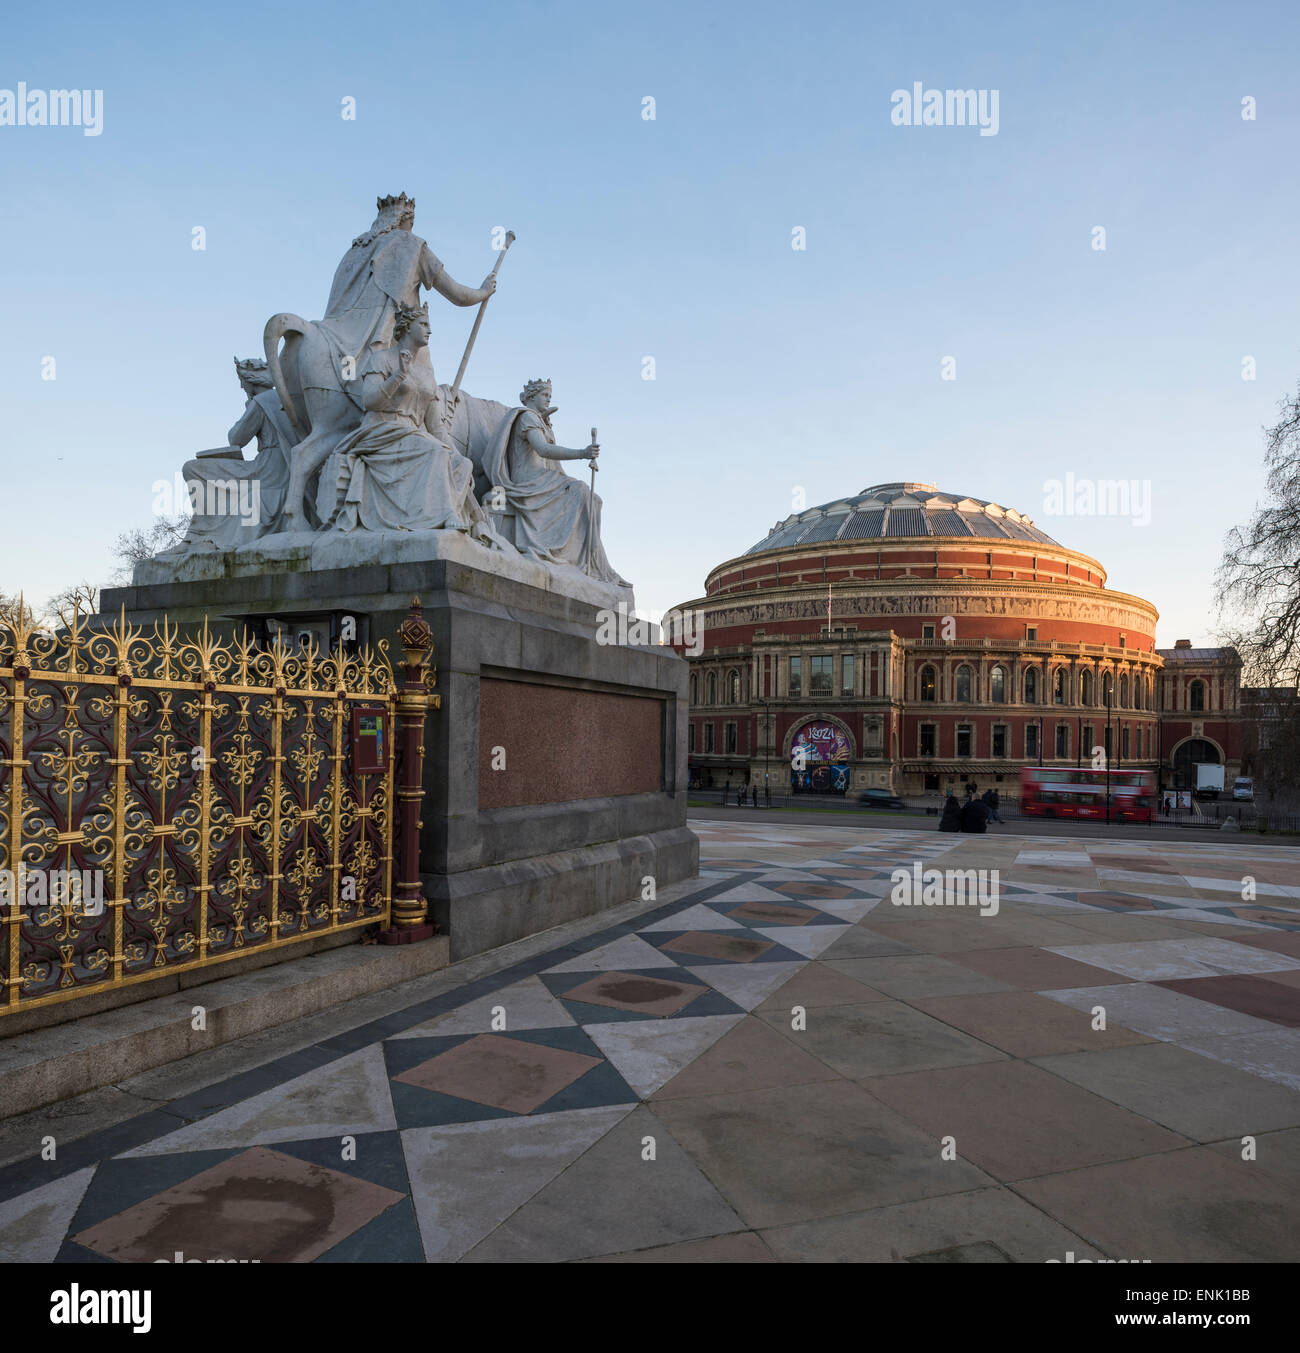 Exterior del Royal Albert Hall desde el Albert Memorial, Kensington, Londres, Inglaterra, Reino Unido, Europa Imagen De Stock